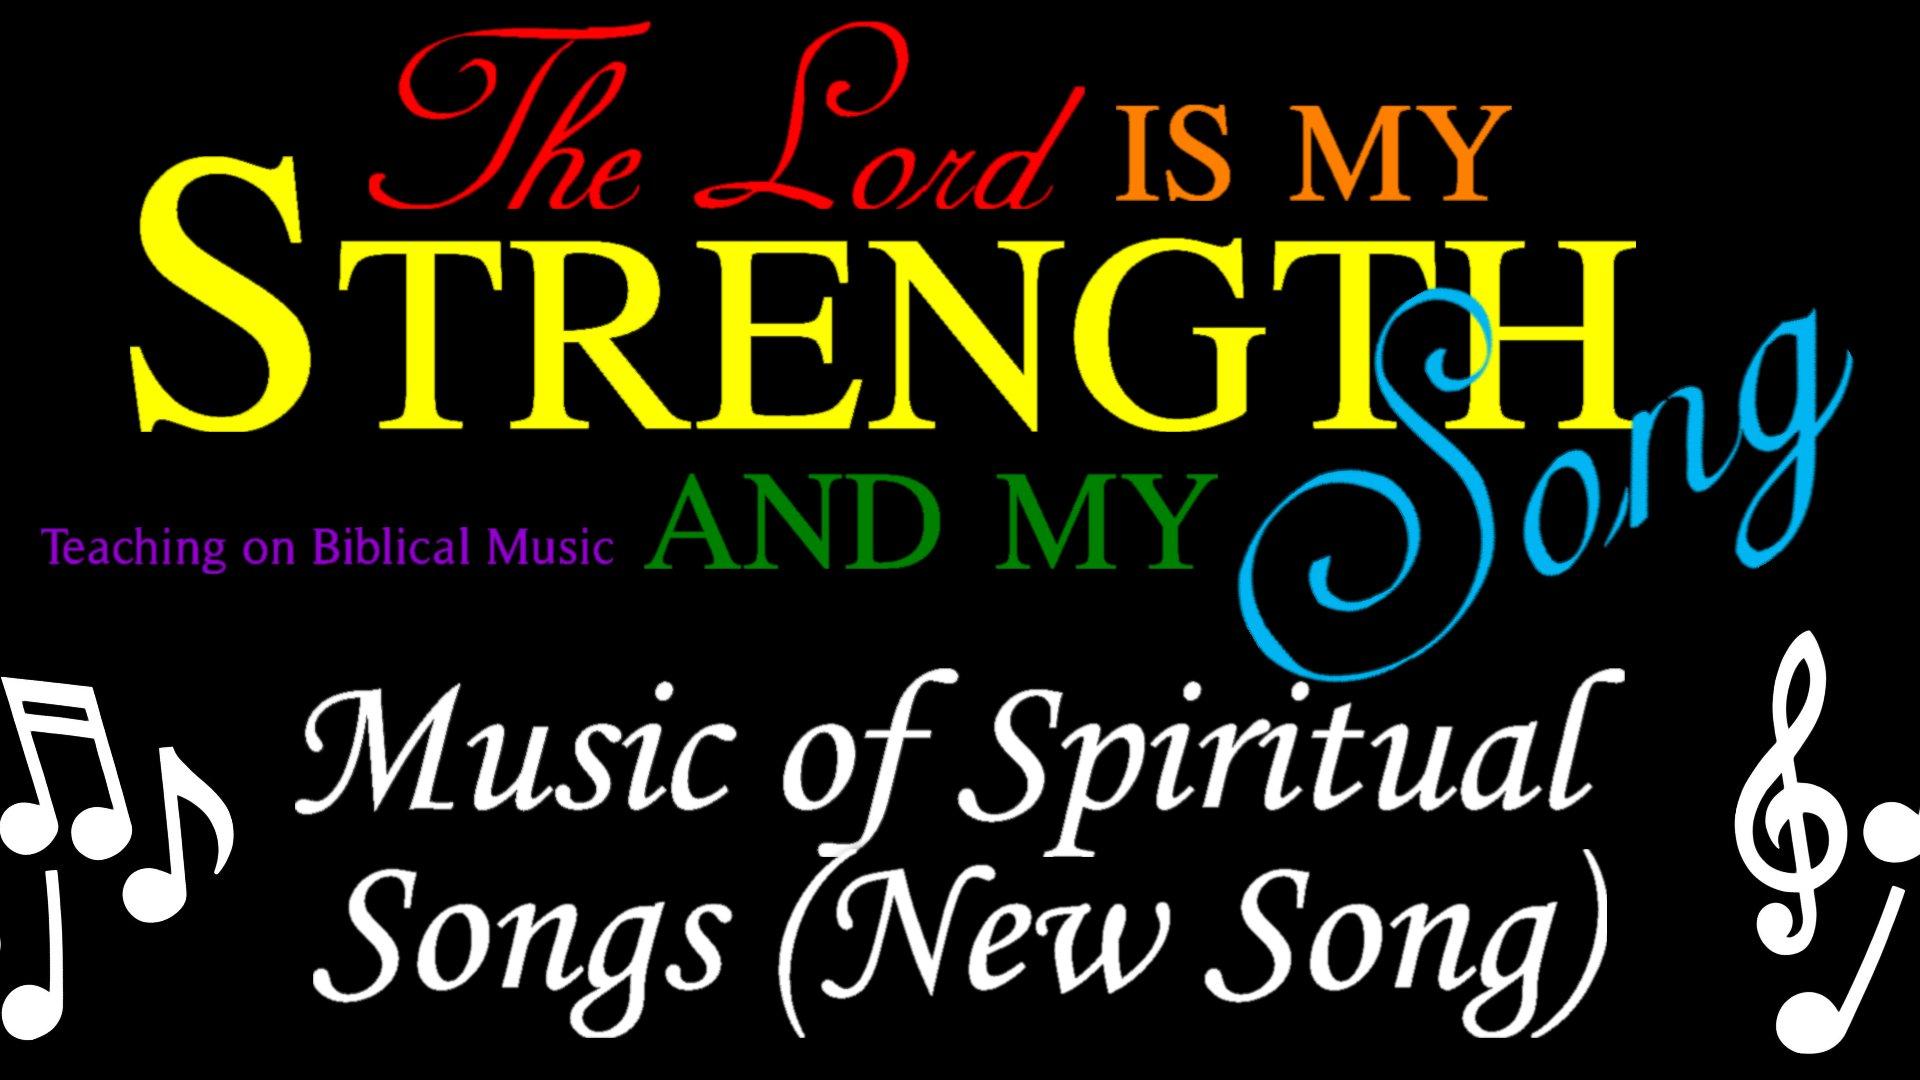 08 Music of Spiritual Songs (New Songs)